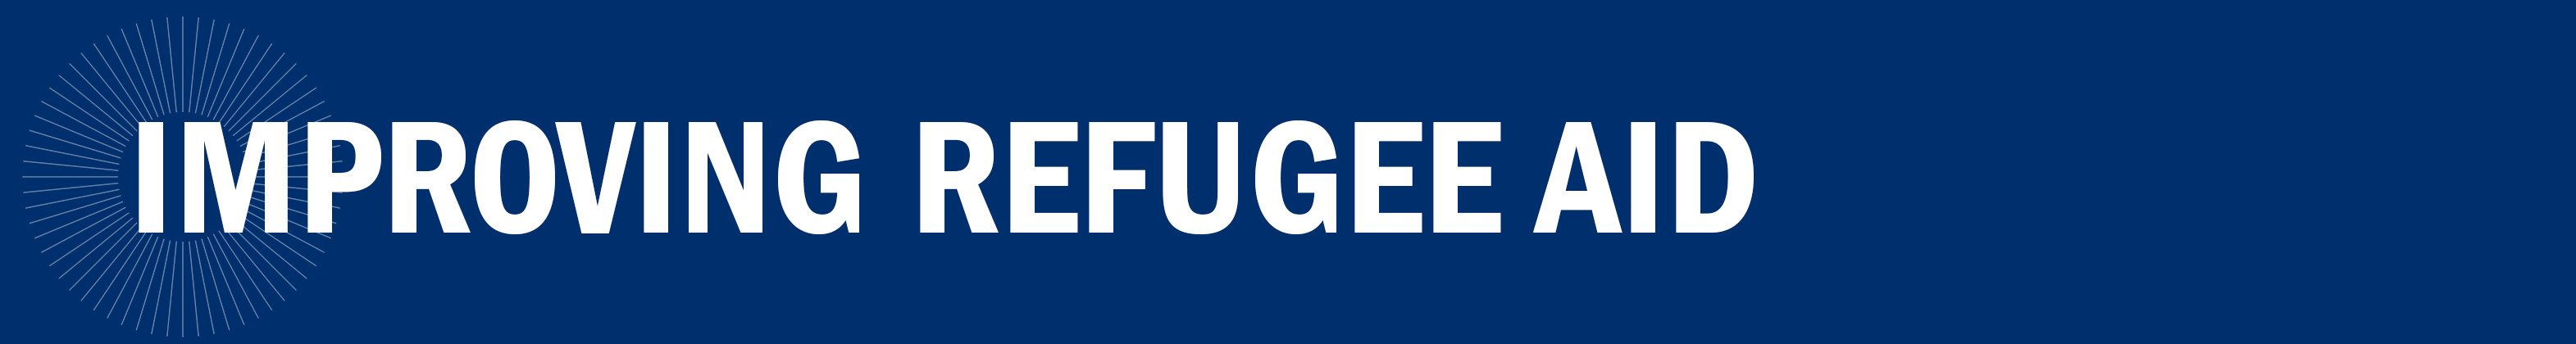 Improving Refugee Aid